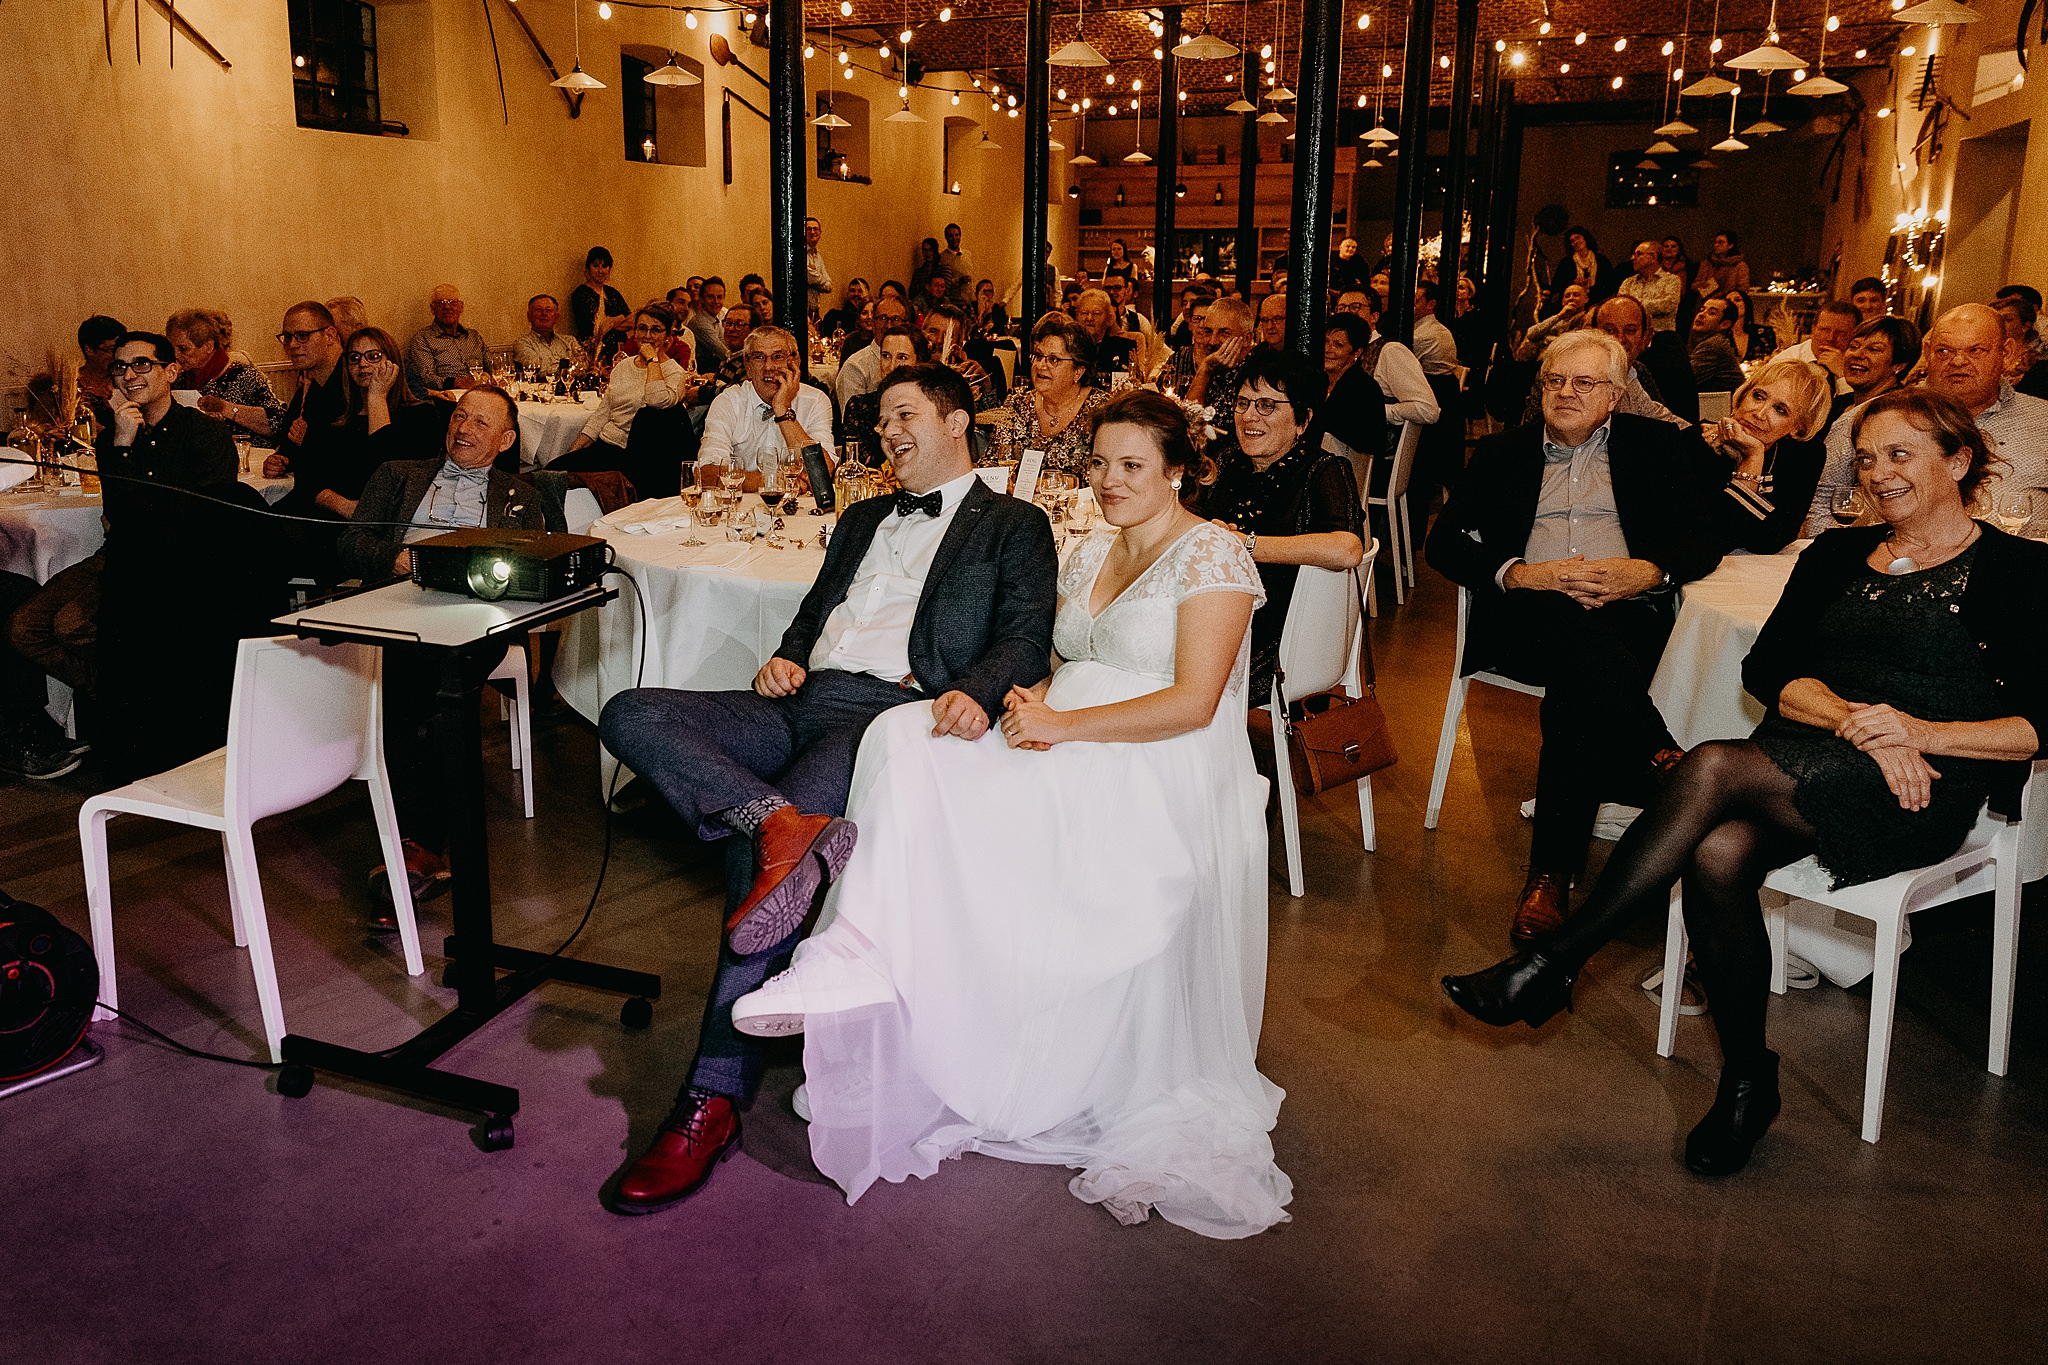 Aulnenhof bruidspaar presentatie vrienden